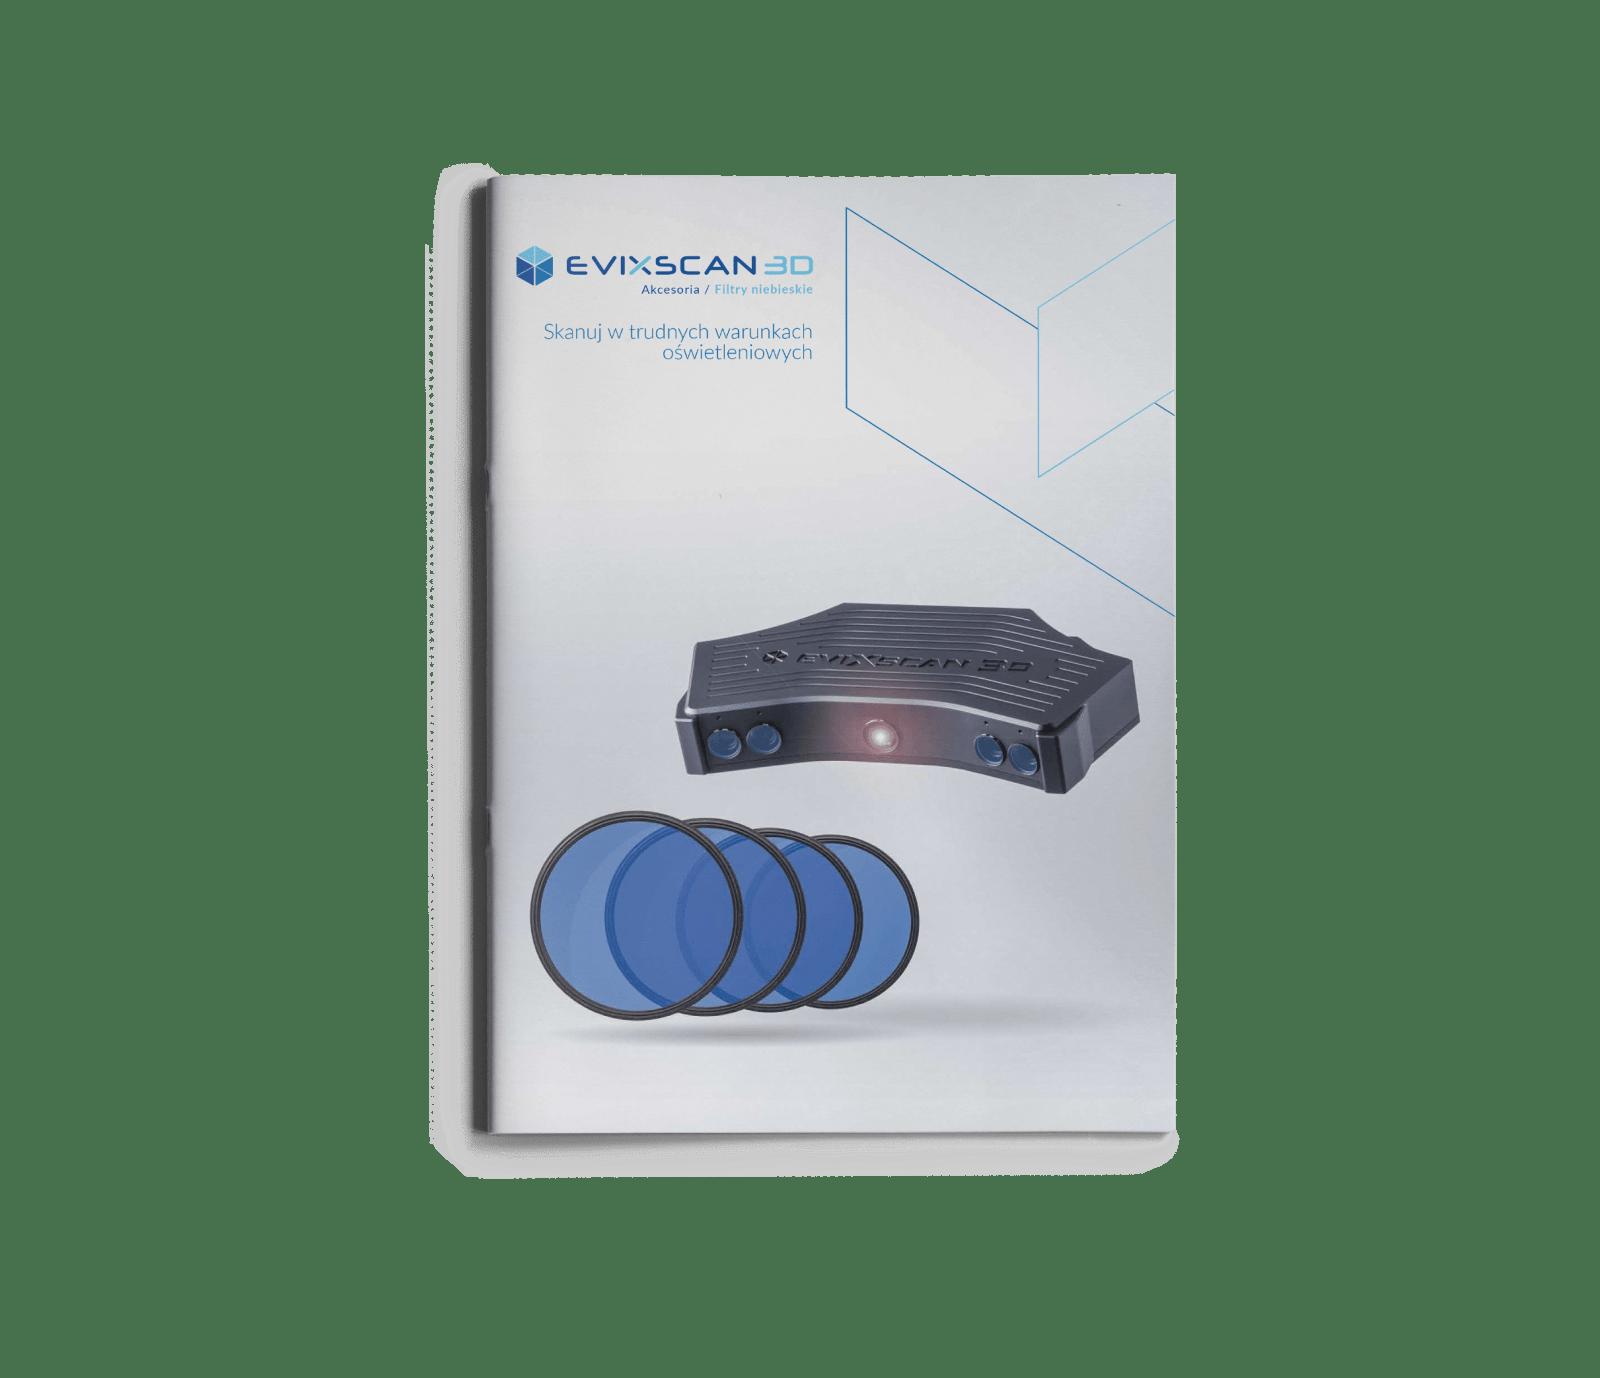 evixscan 3d foldery reklamowe (7)